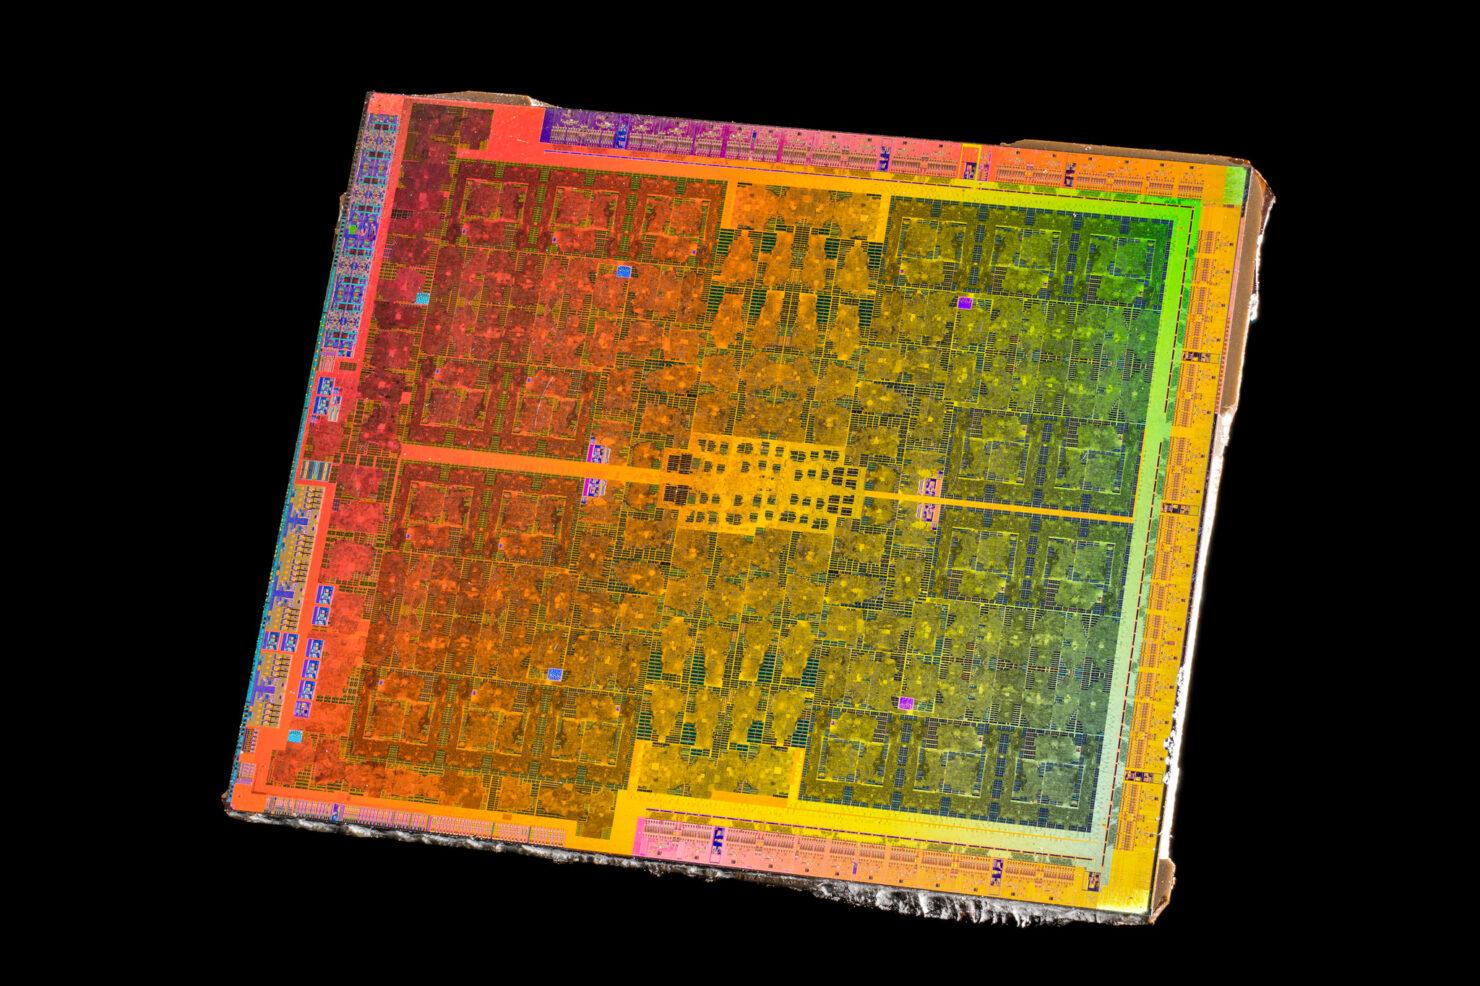 nvidia-gp104-gpu-1